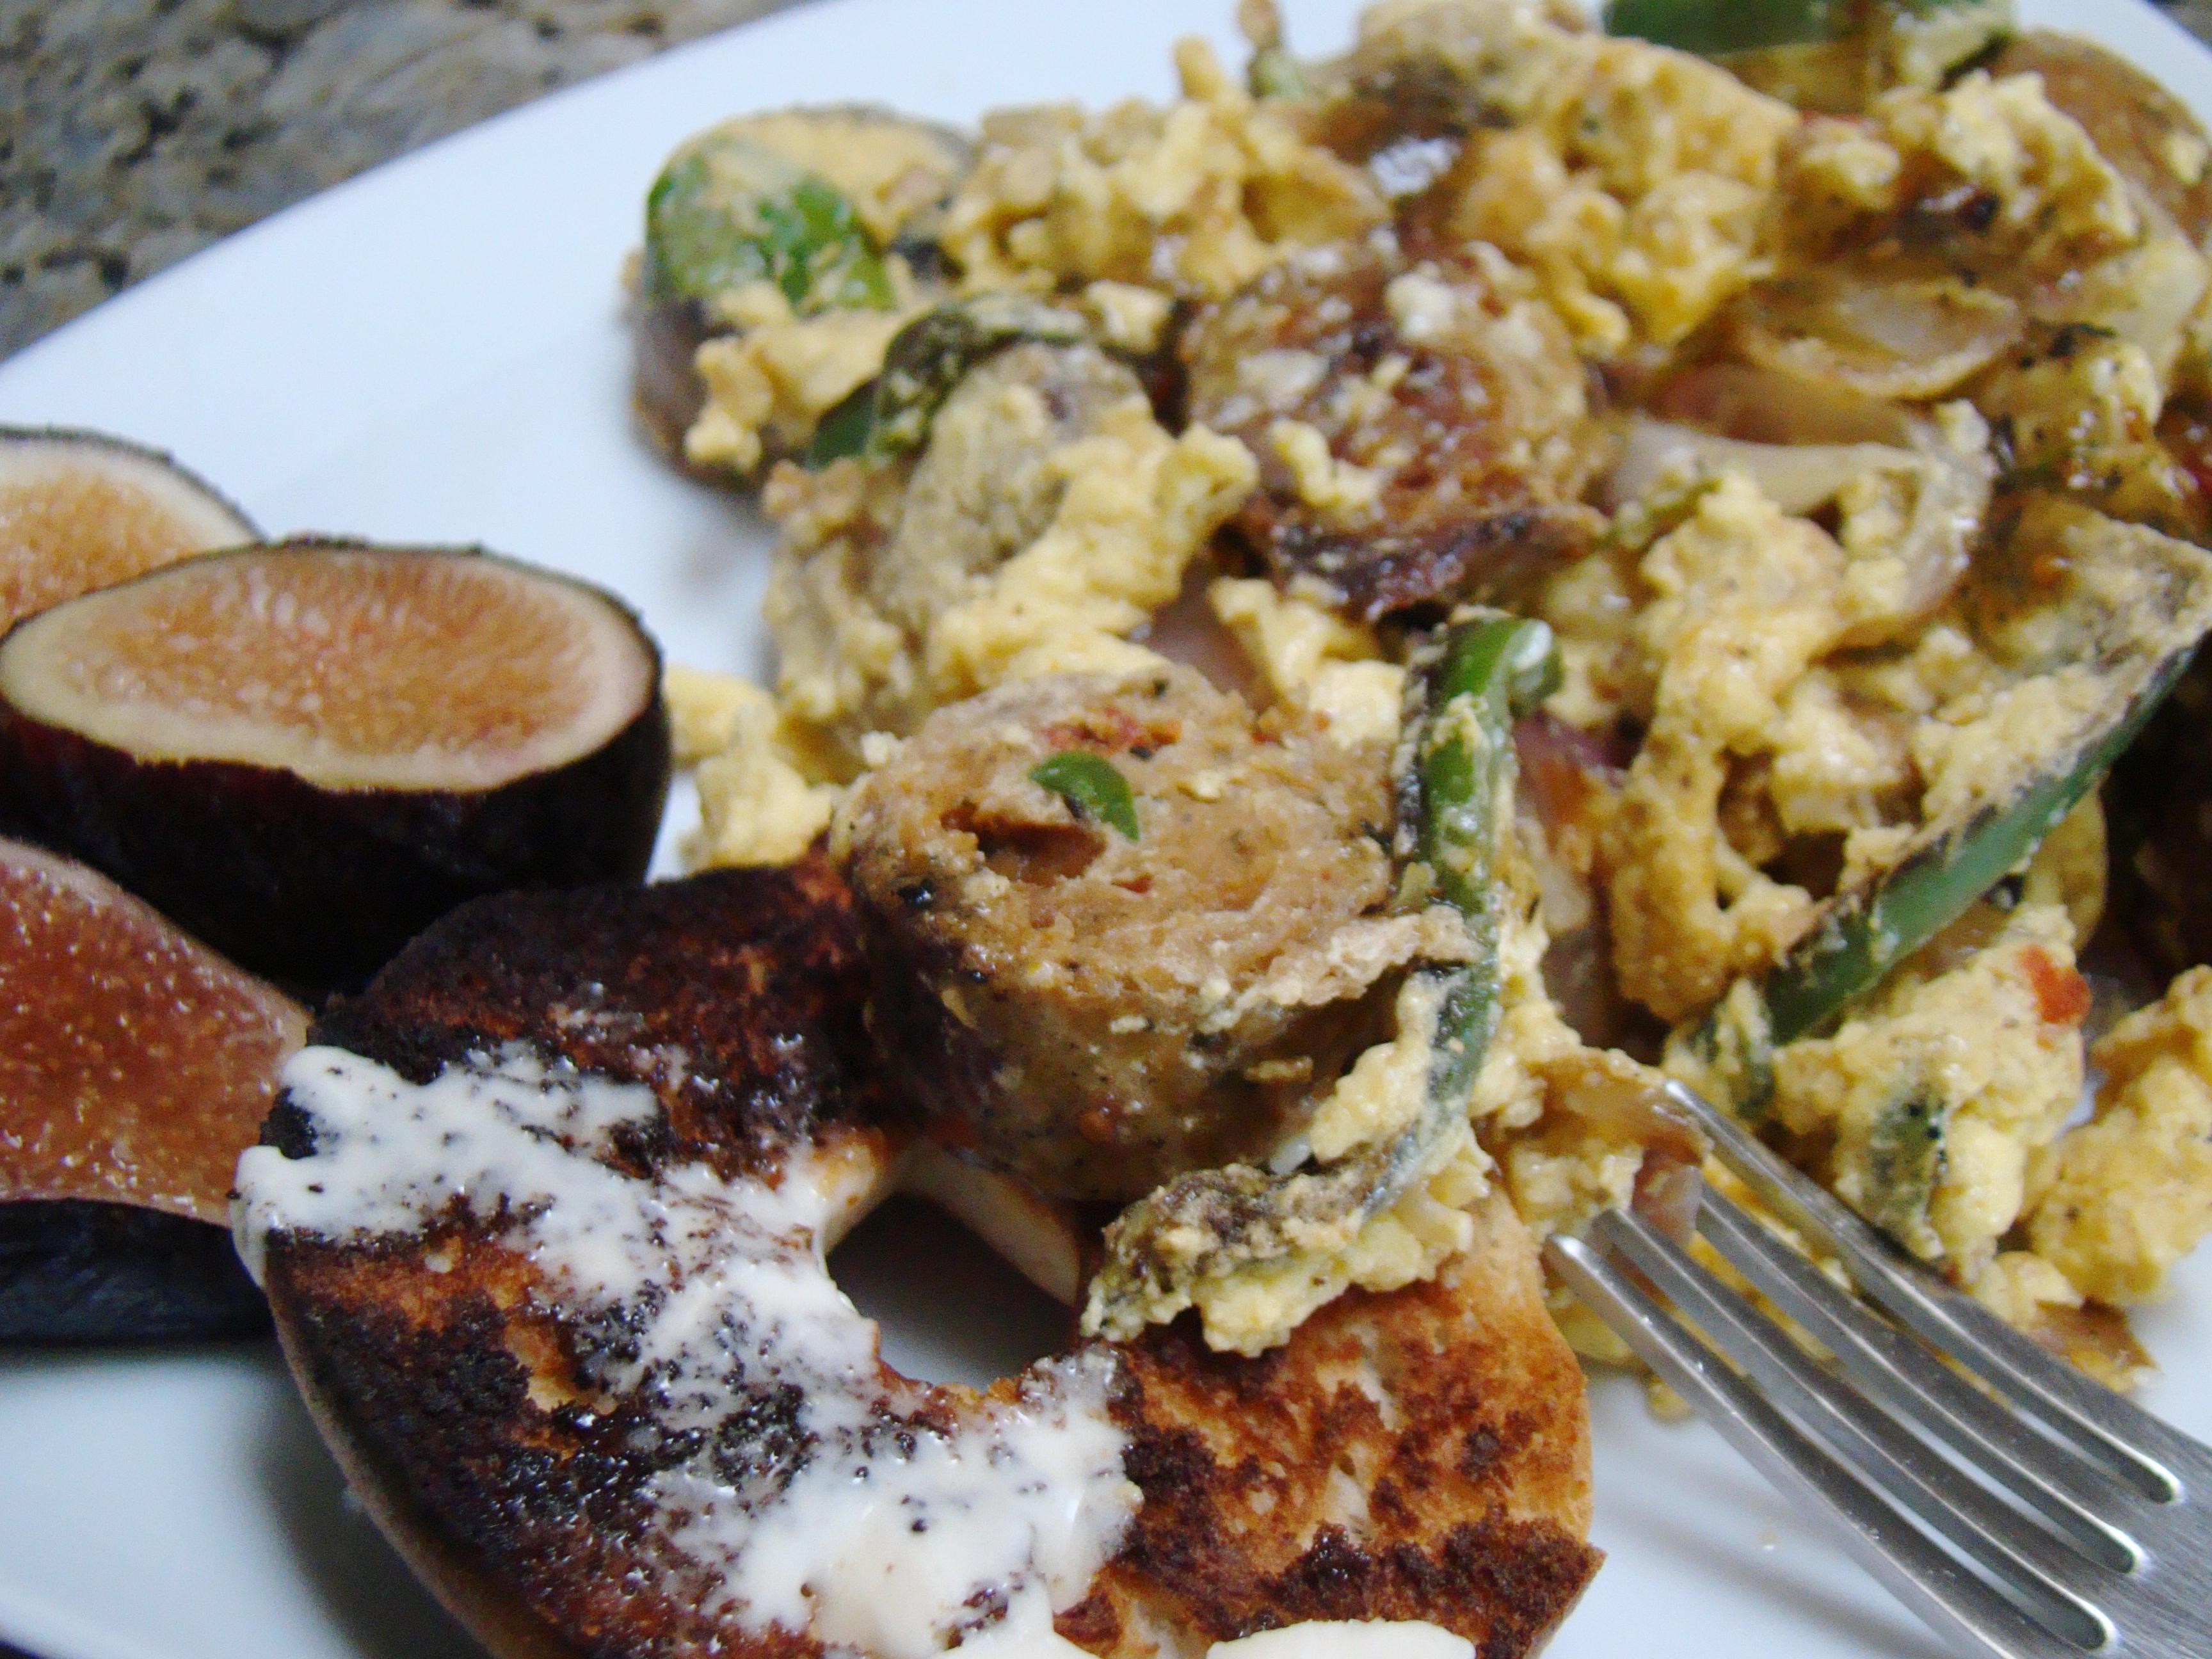 Tofu scramble with seitan sausage and jalapenos